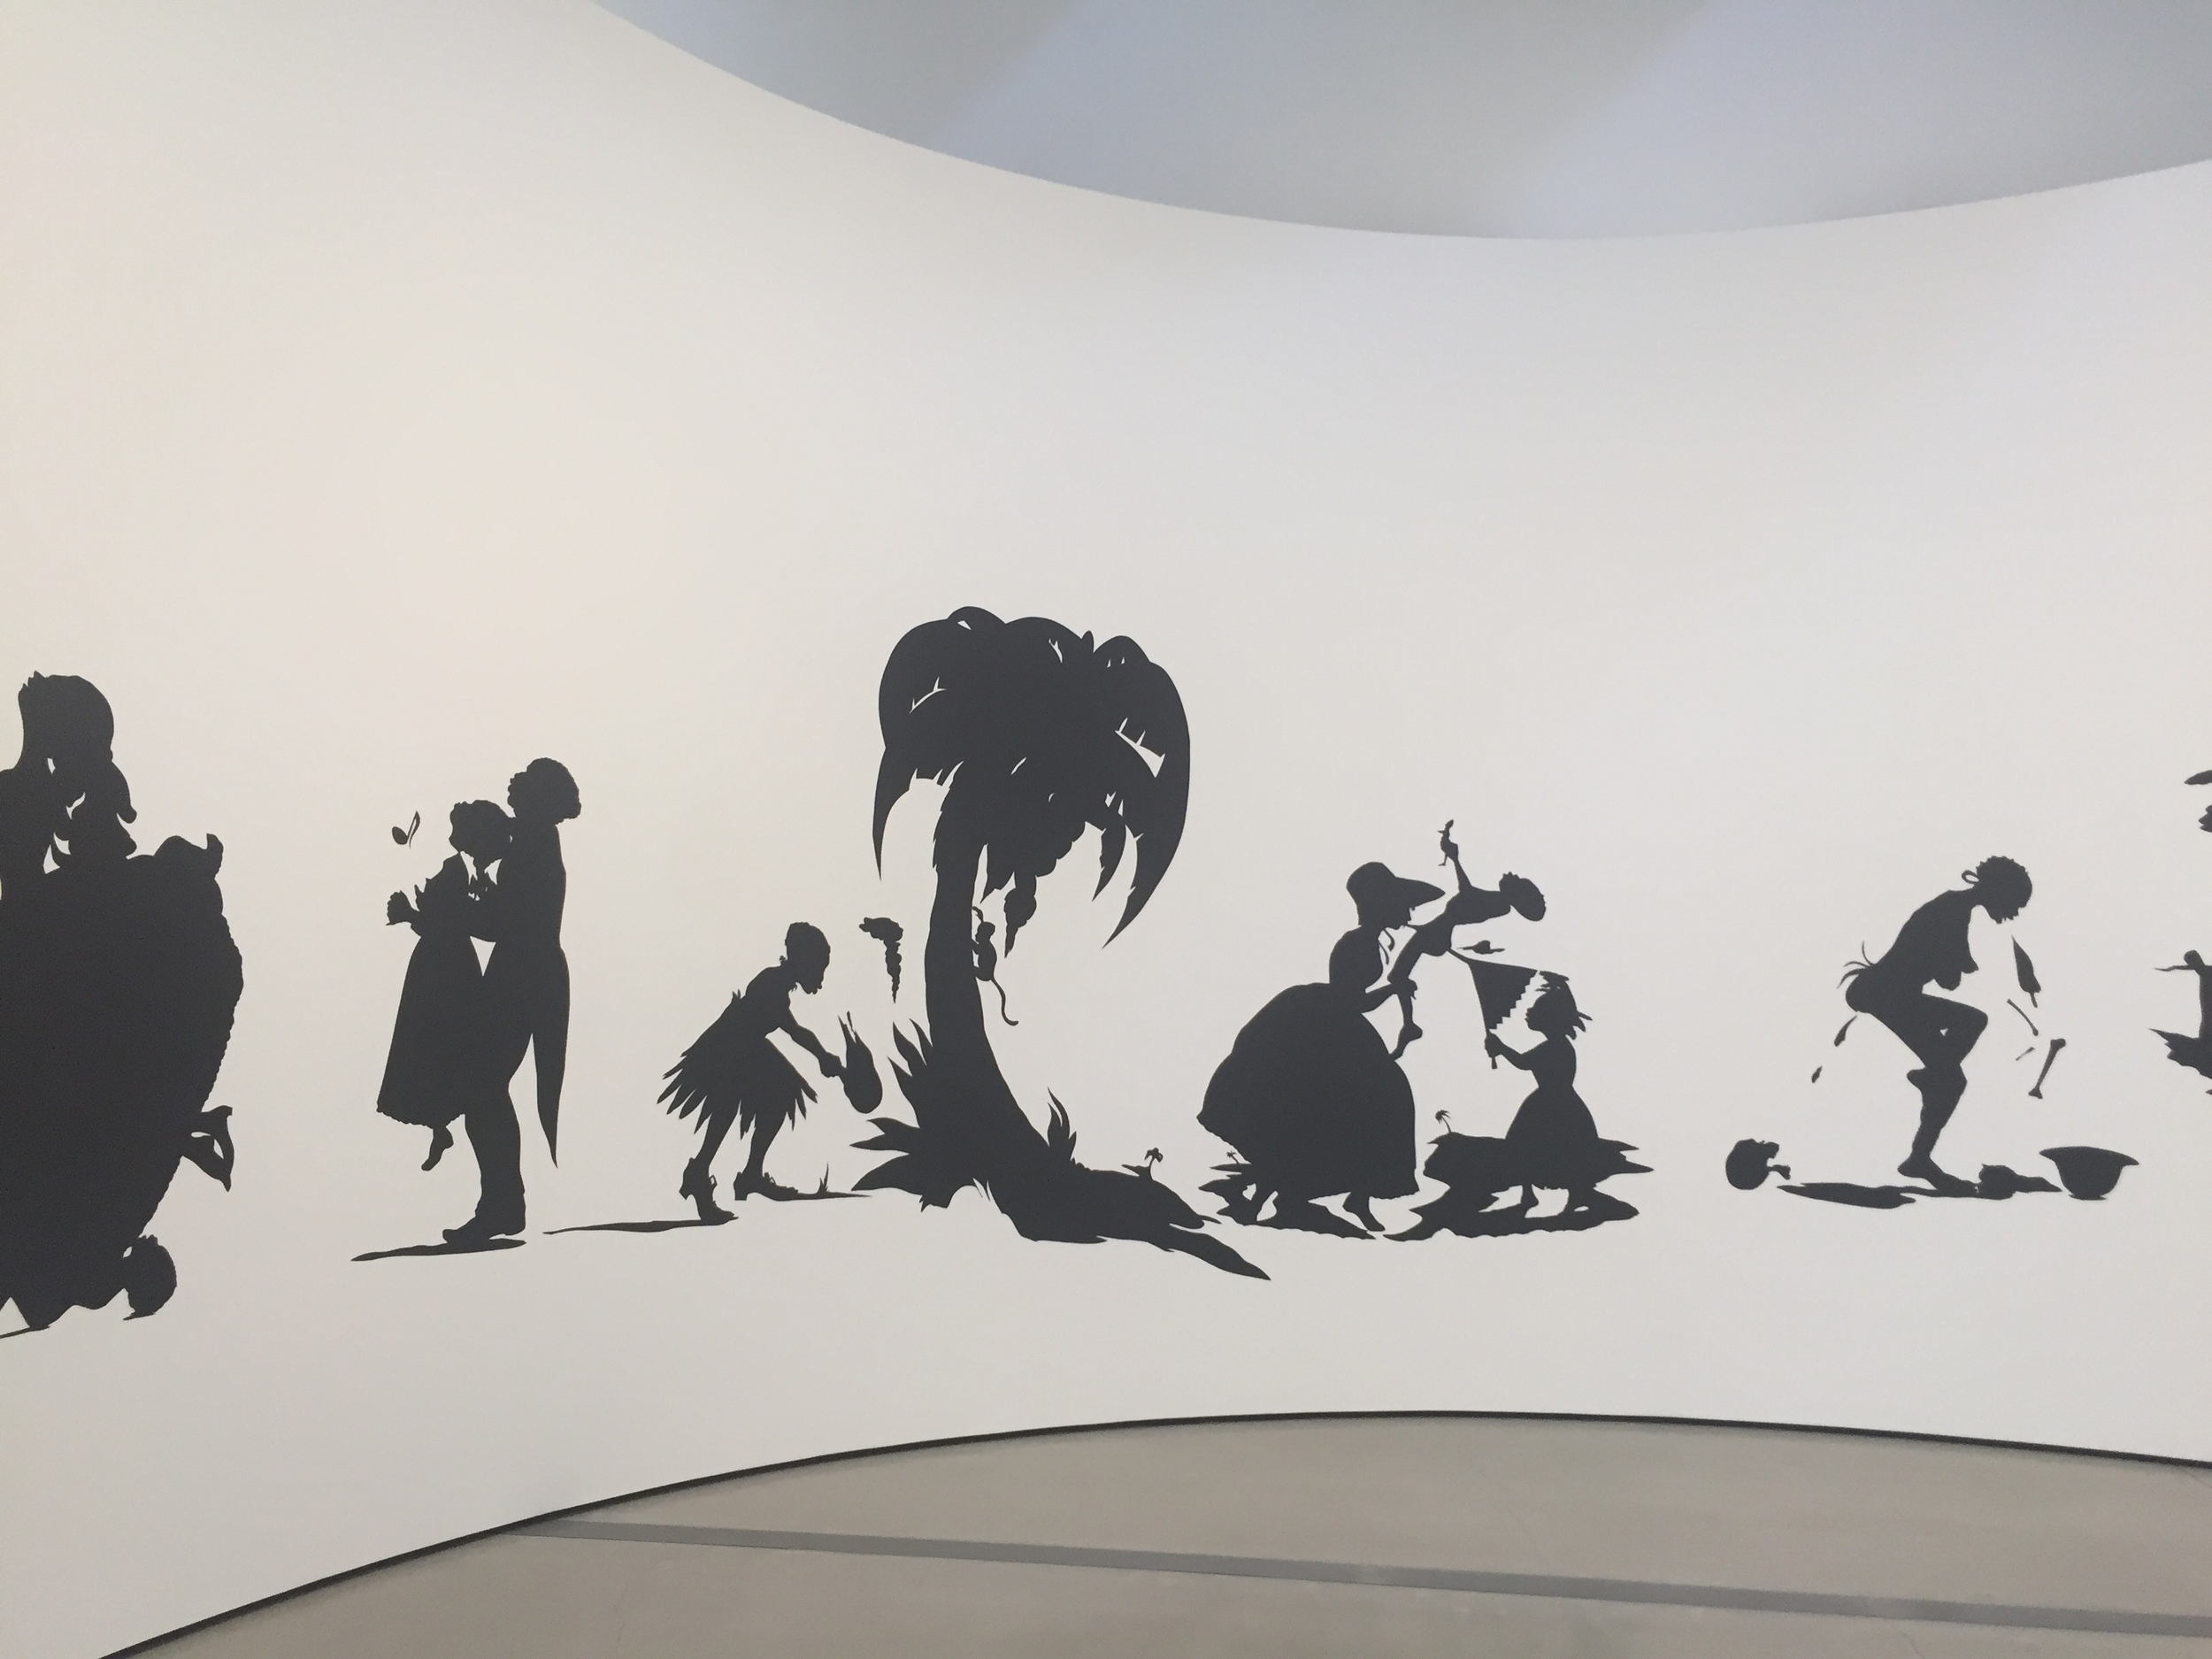 Picture I took at The Broad Museum in Los Angeles of Kara Walker's work.